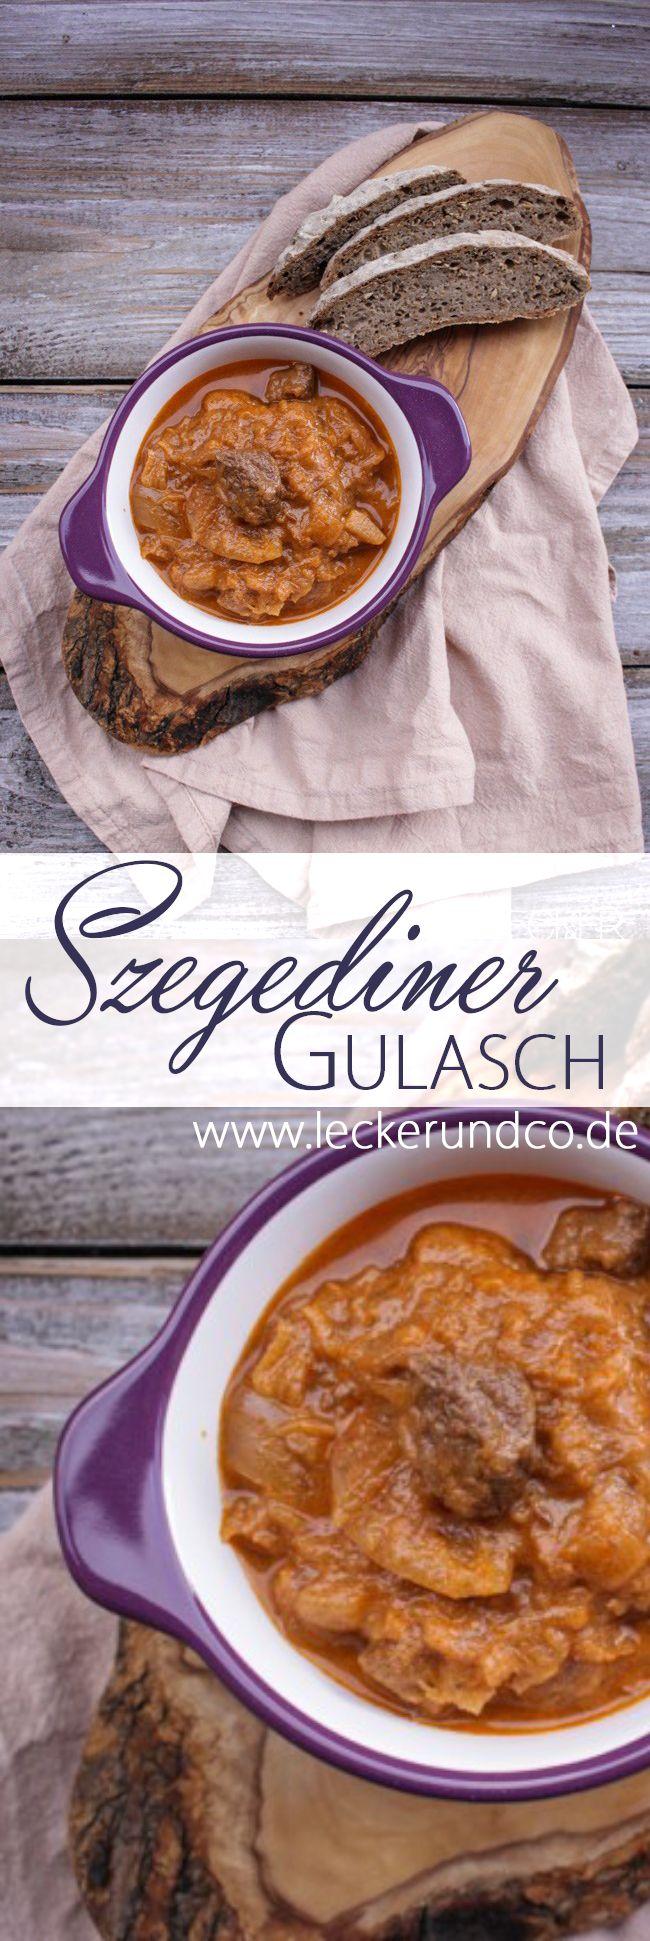 Szegediner Gulasch | Gulasch mit Sauerkraut